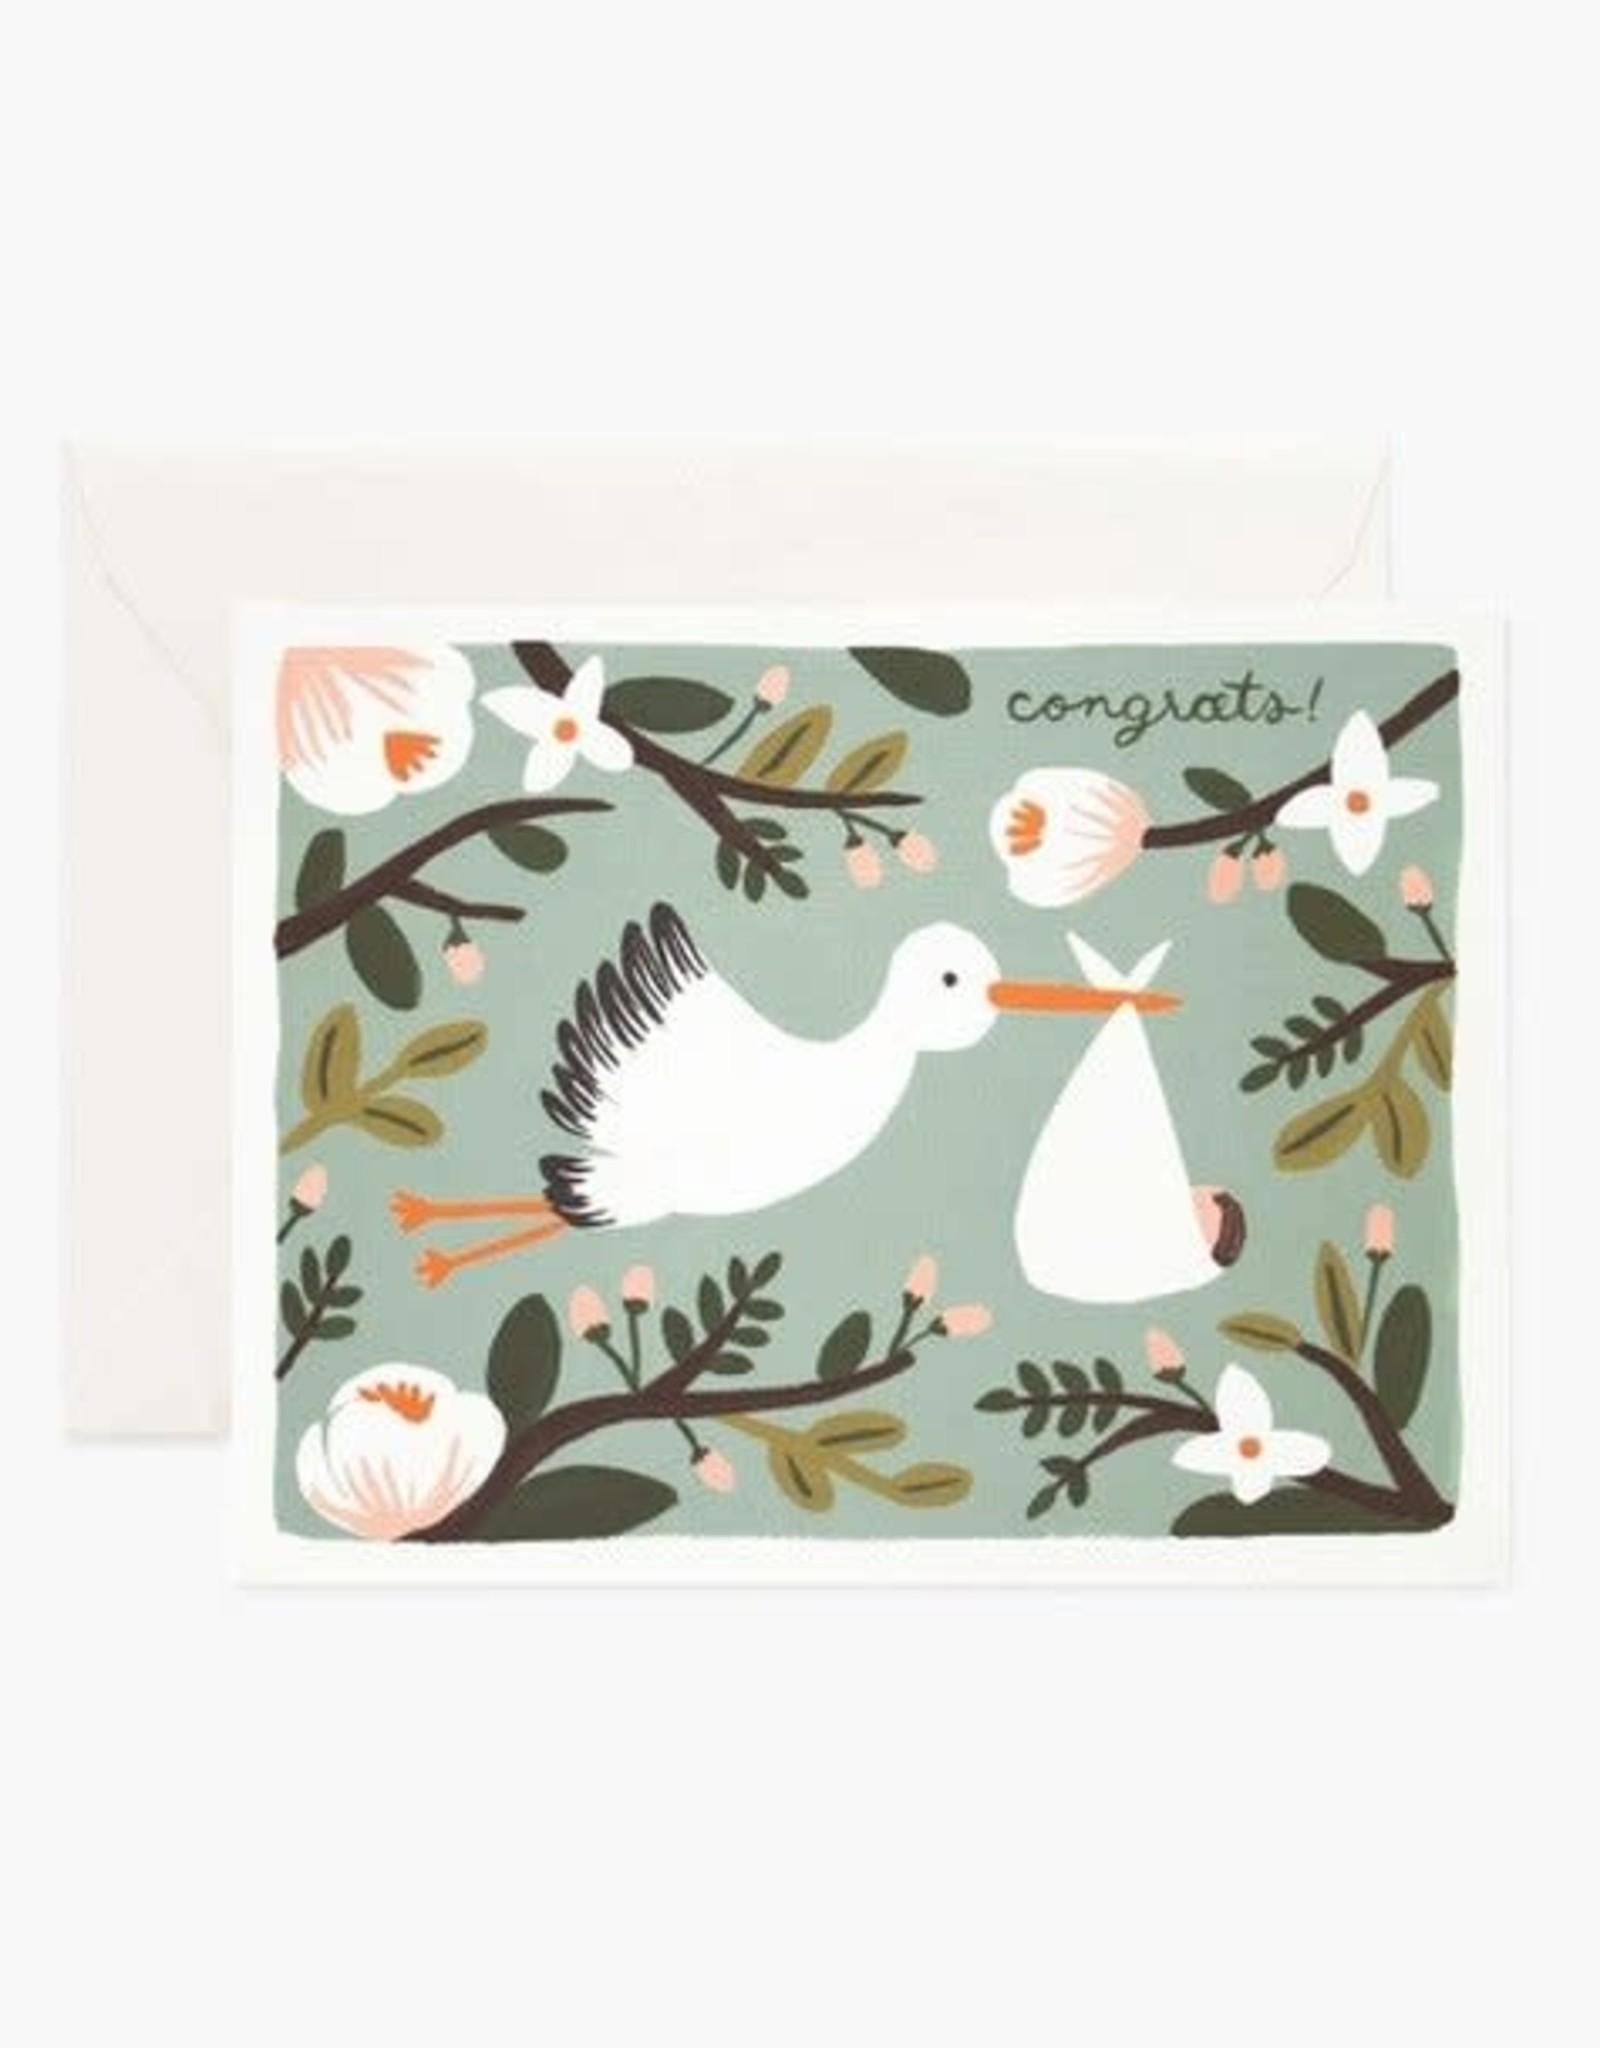 Rifle Paper Co. Congrats Stork Card